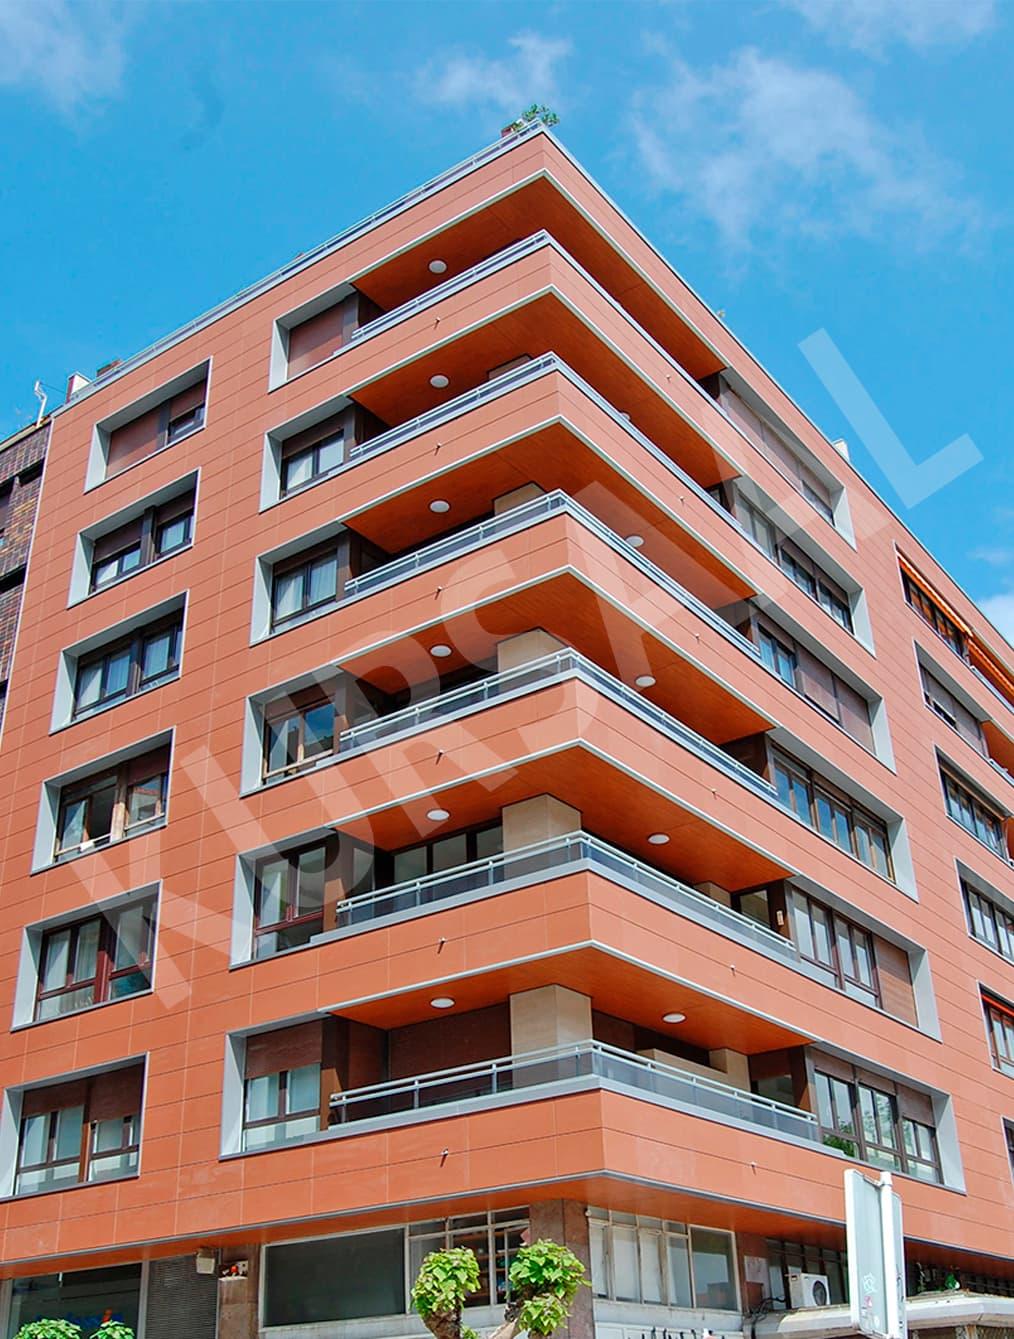 trabajo realizado en: Aislamientos Térmicos y Eficiencia Energética-FACHADA VENTILADA-DONOSTIA, GIPUZKOA-Ategorrieta 29